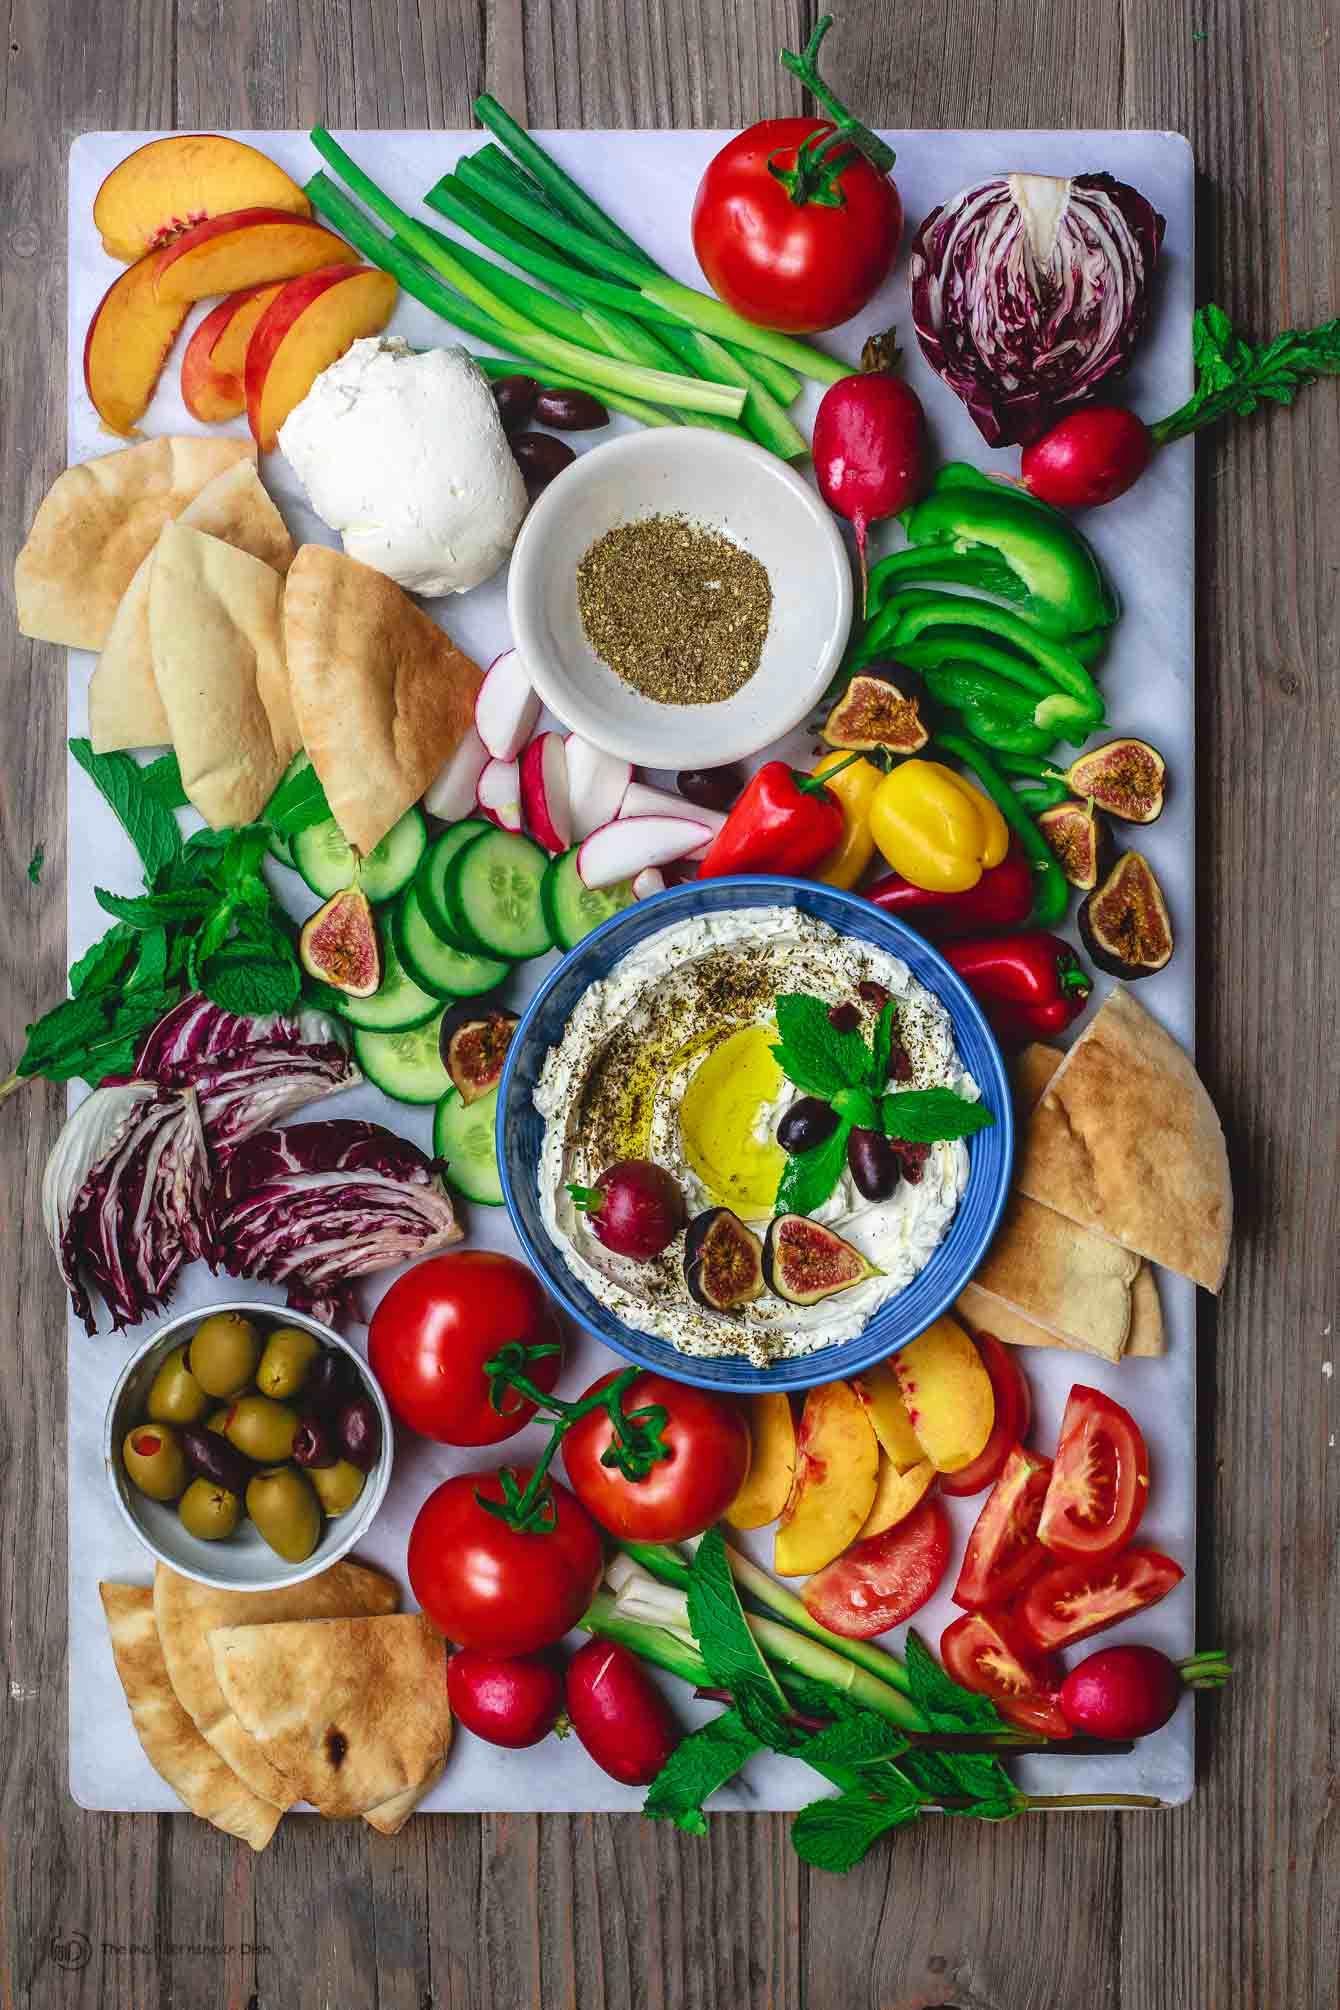 Homemade Labneh Recipe How To Make